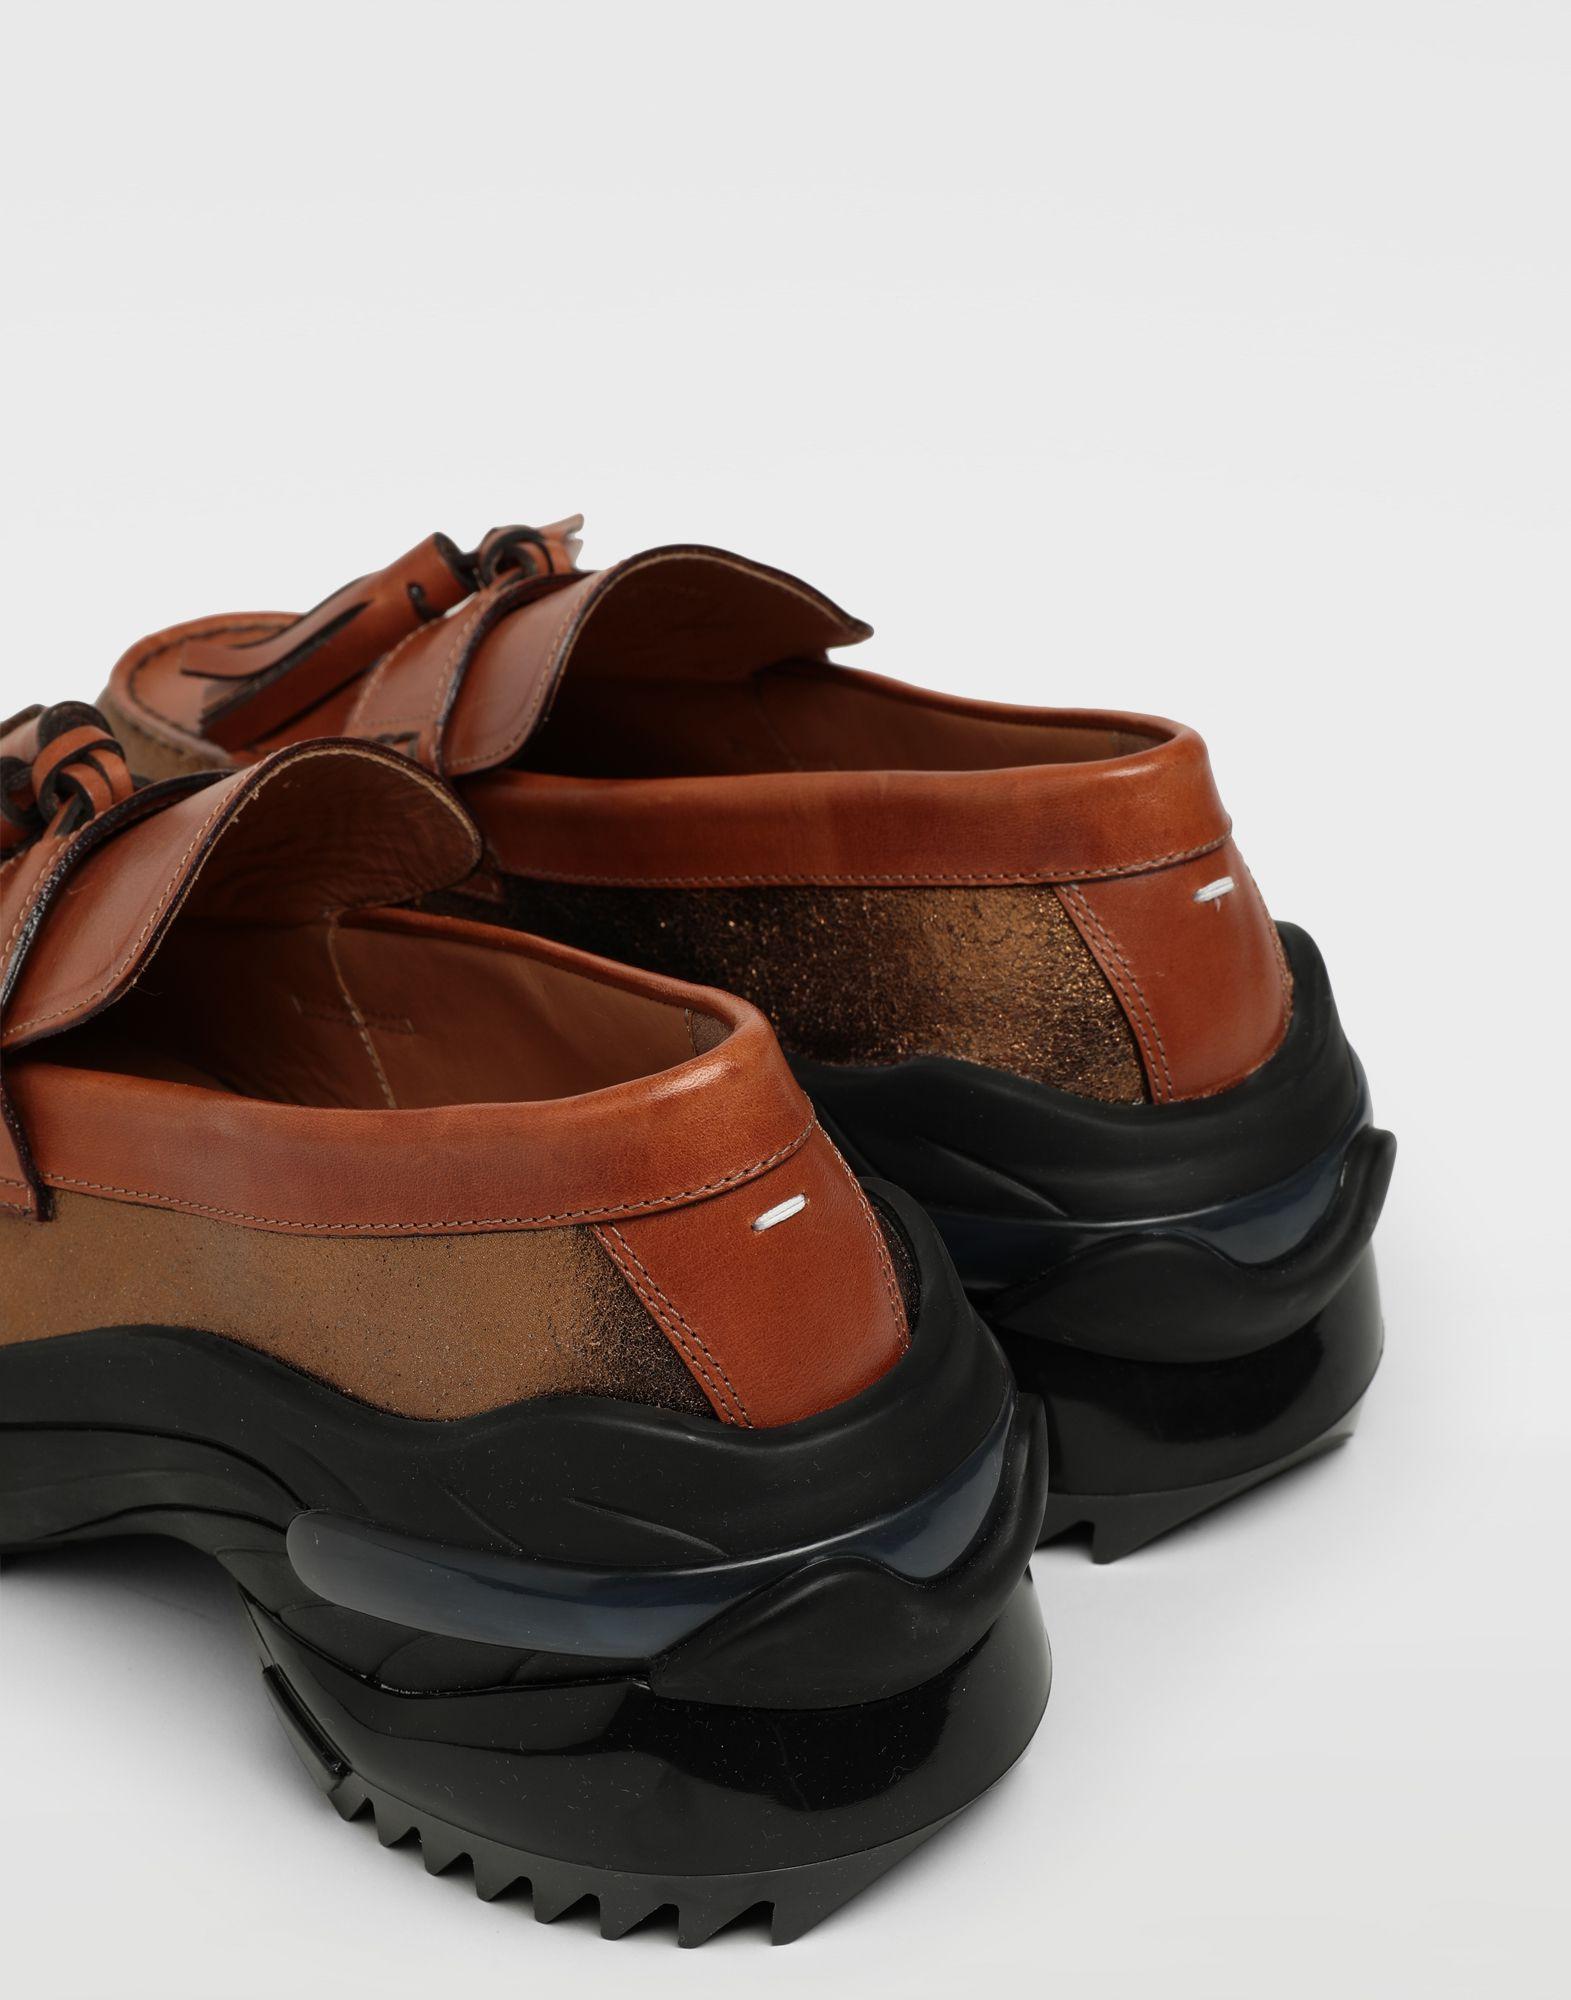 MAISON MARGIELA Gespleißte Sneakers mit Tasselloafer Mokassins Herren e